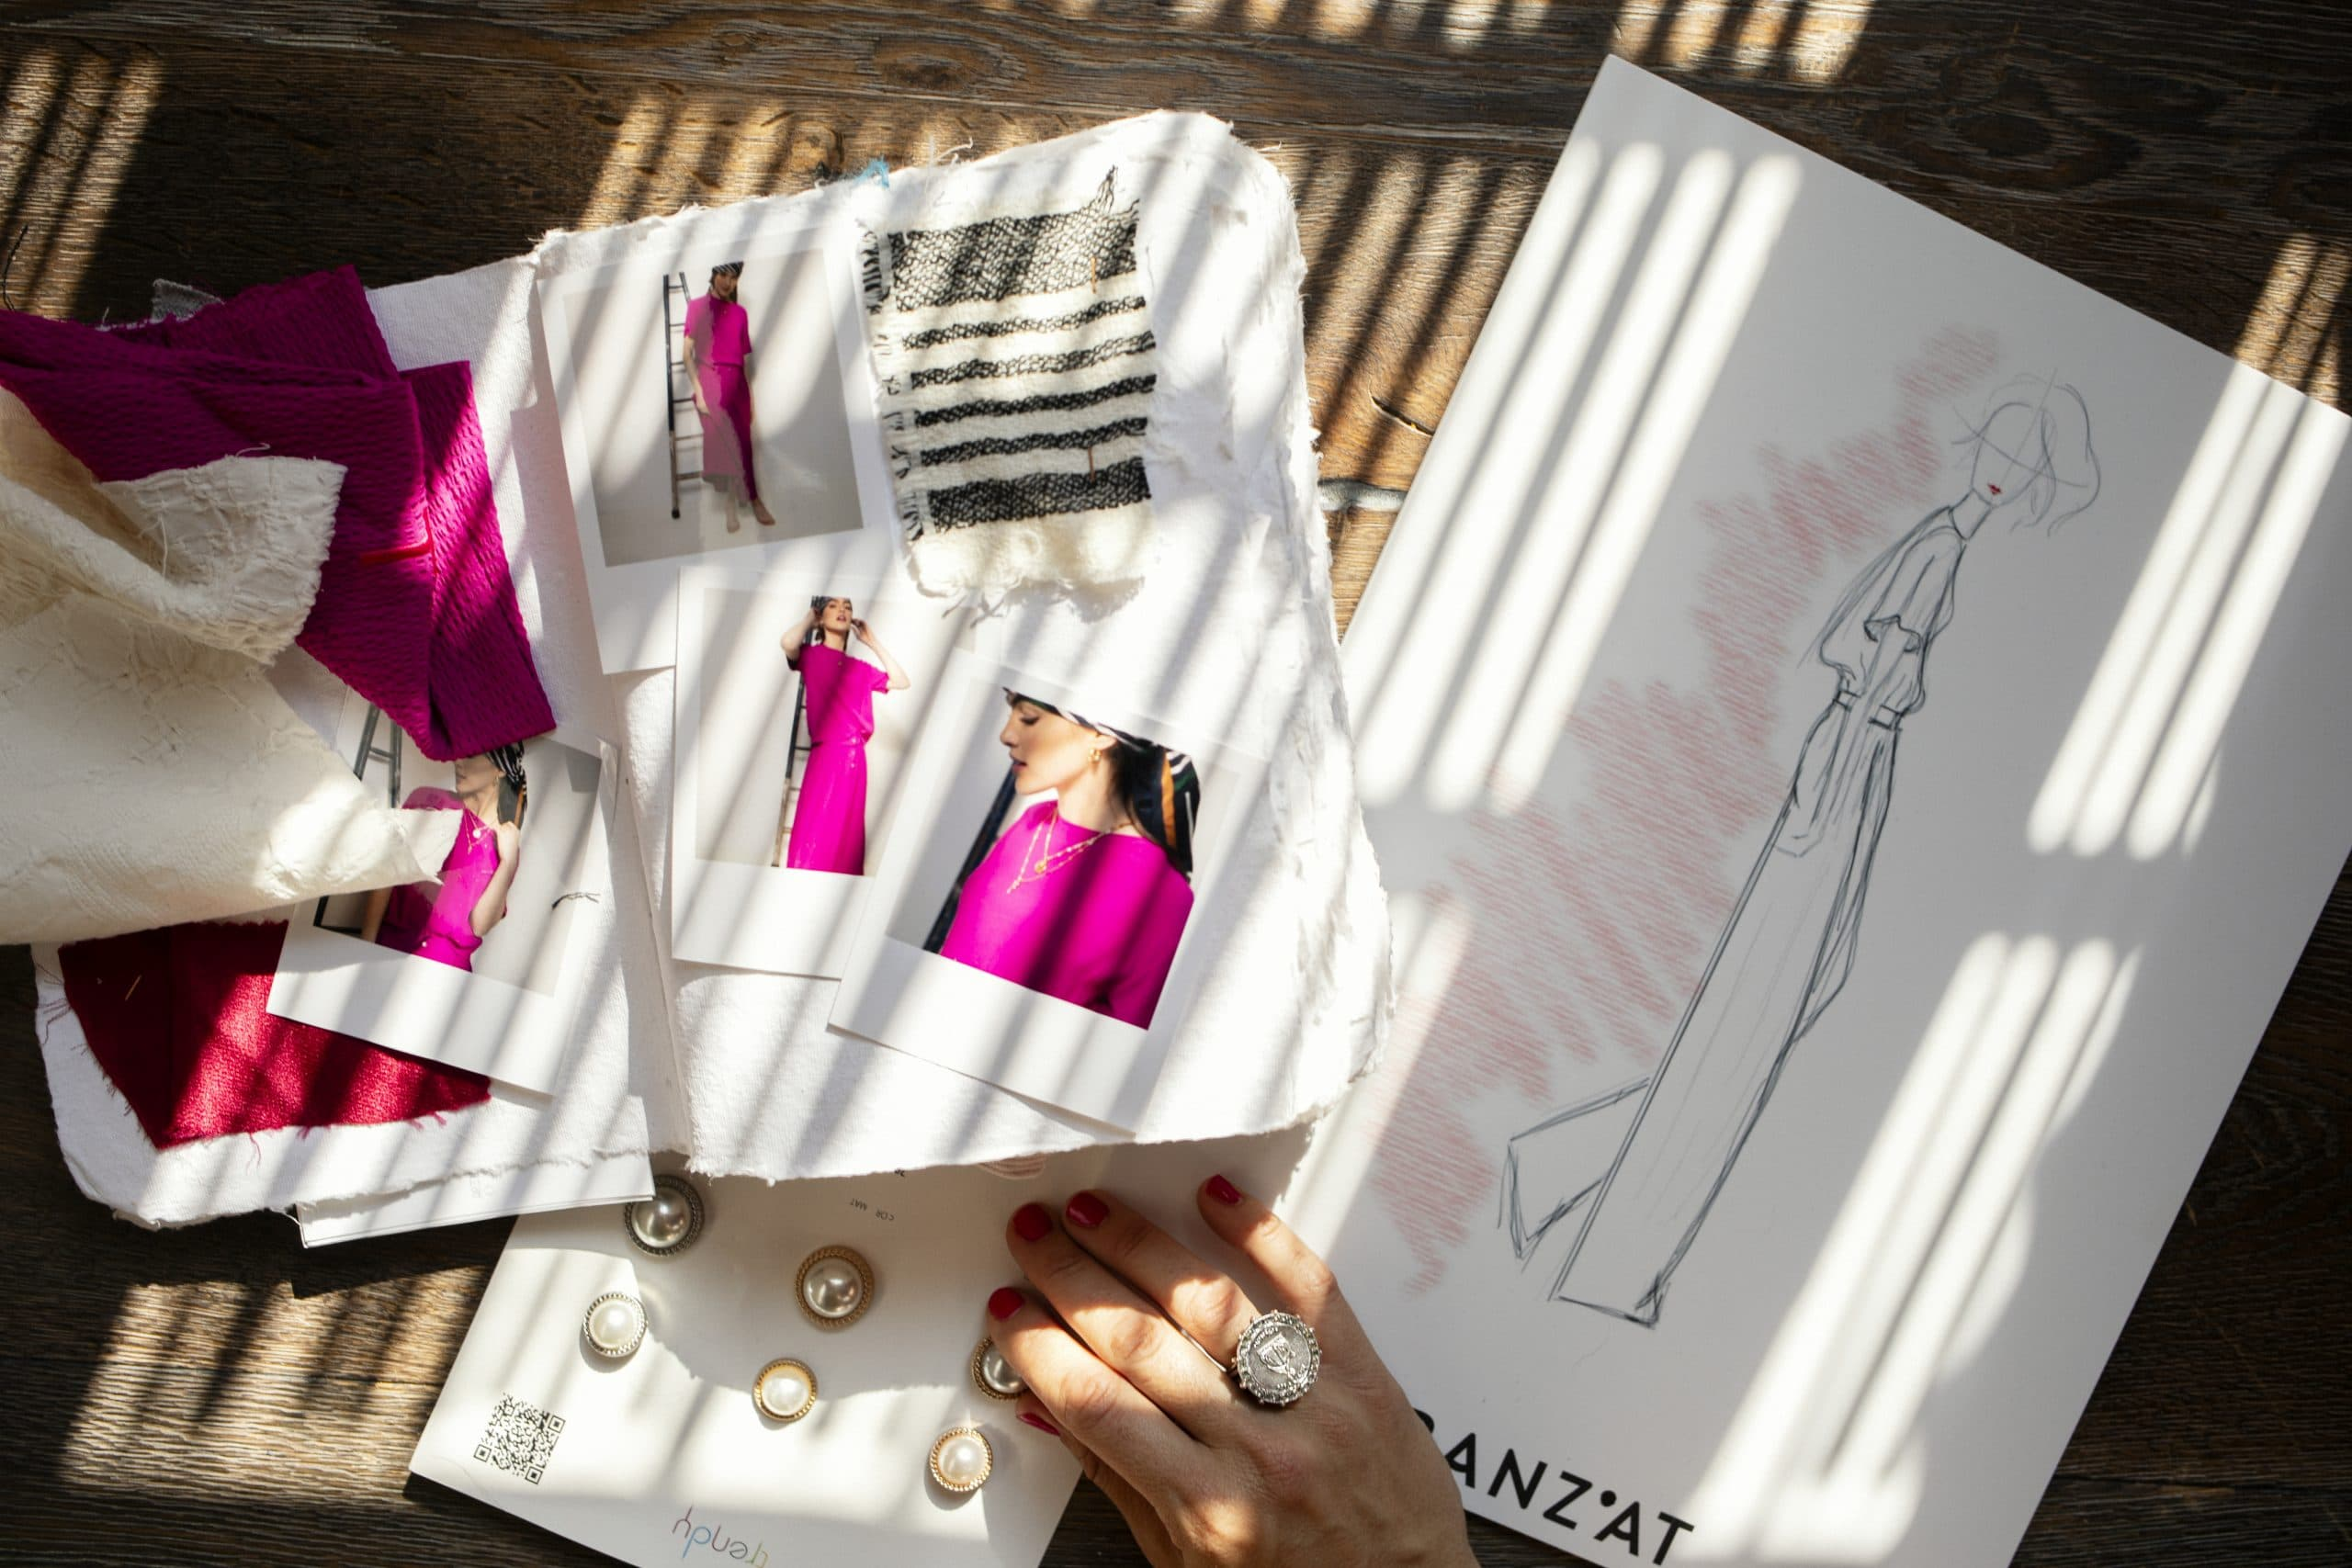 tranzat-maylis-designer-stories-selection-mode-responsable-facetofaceparis